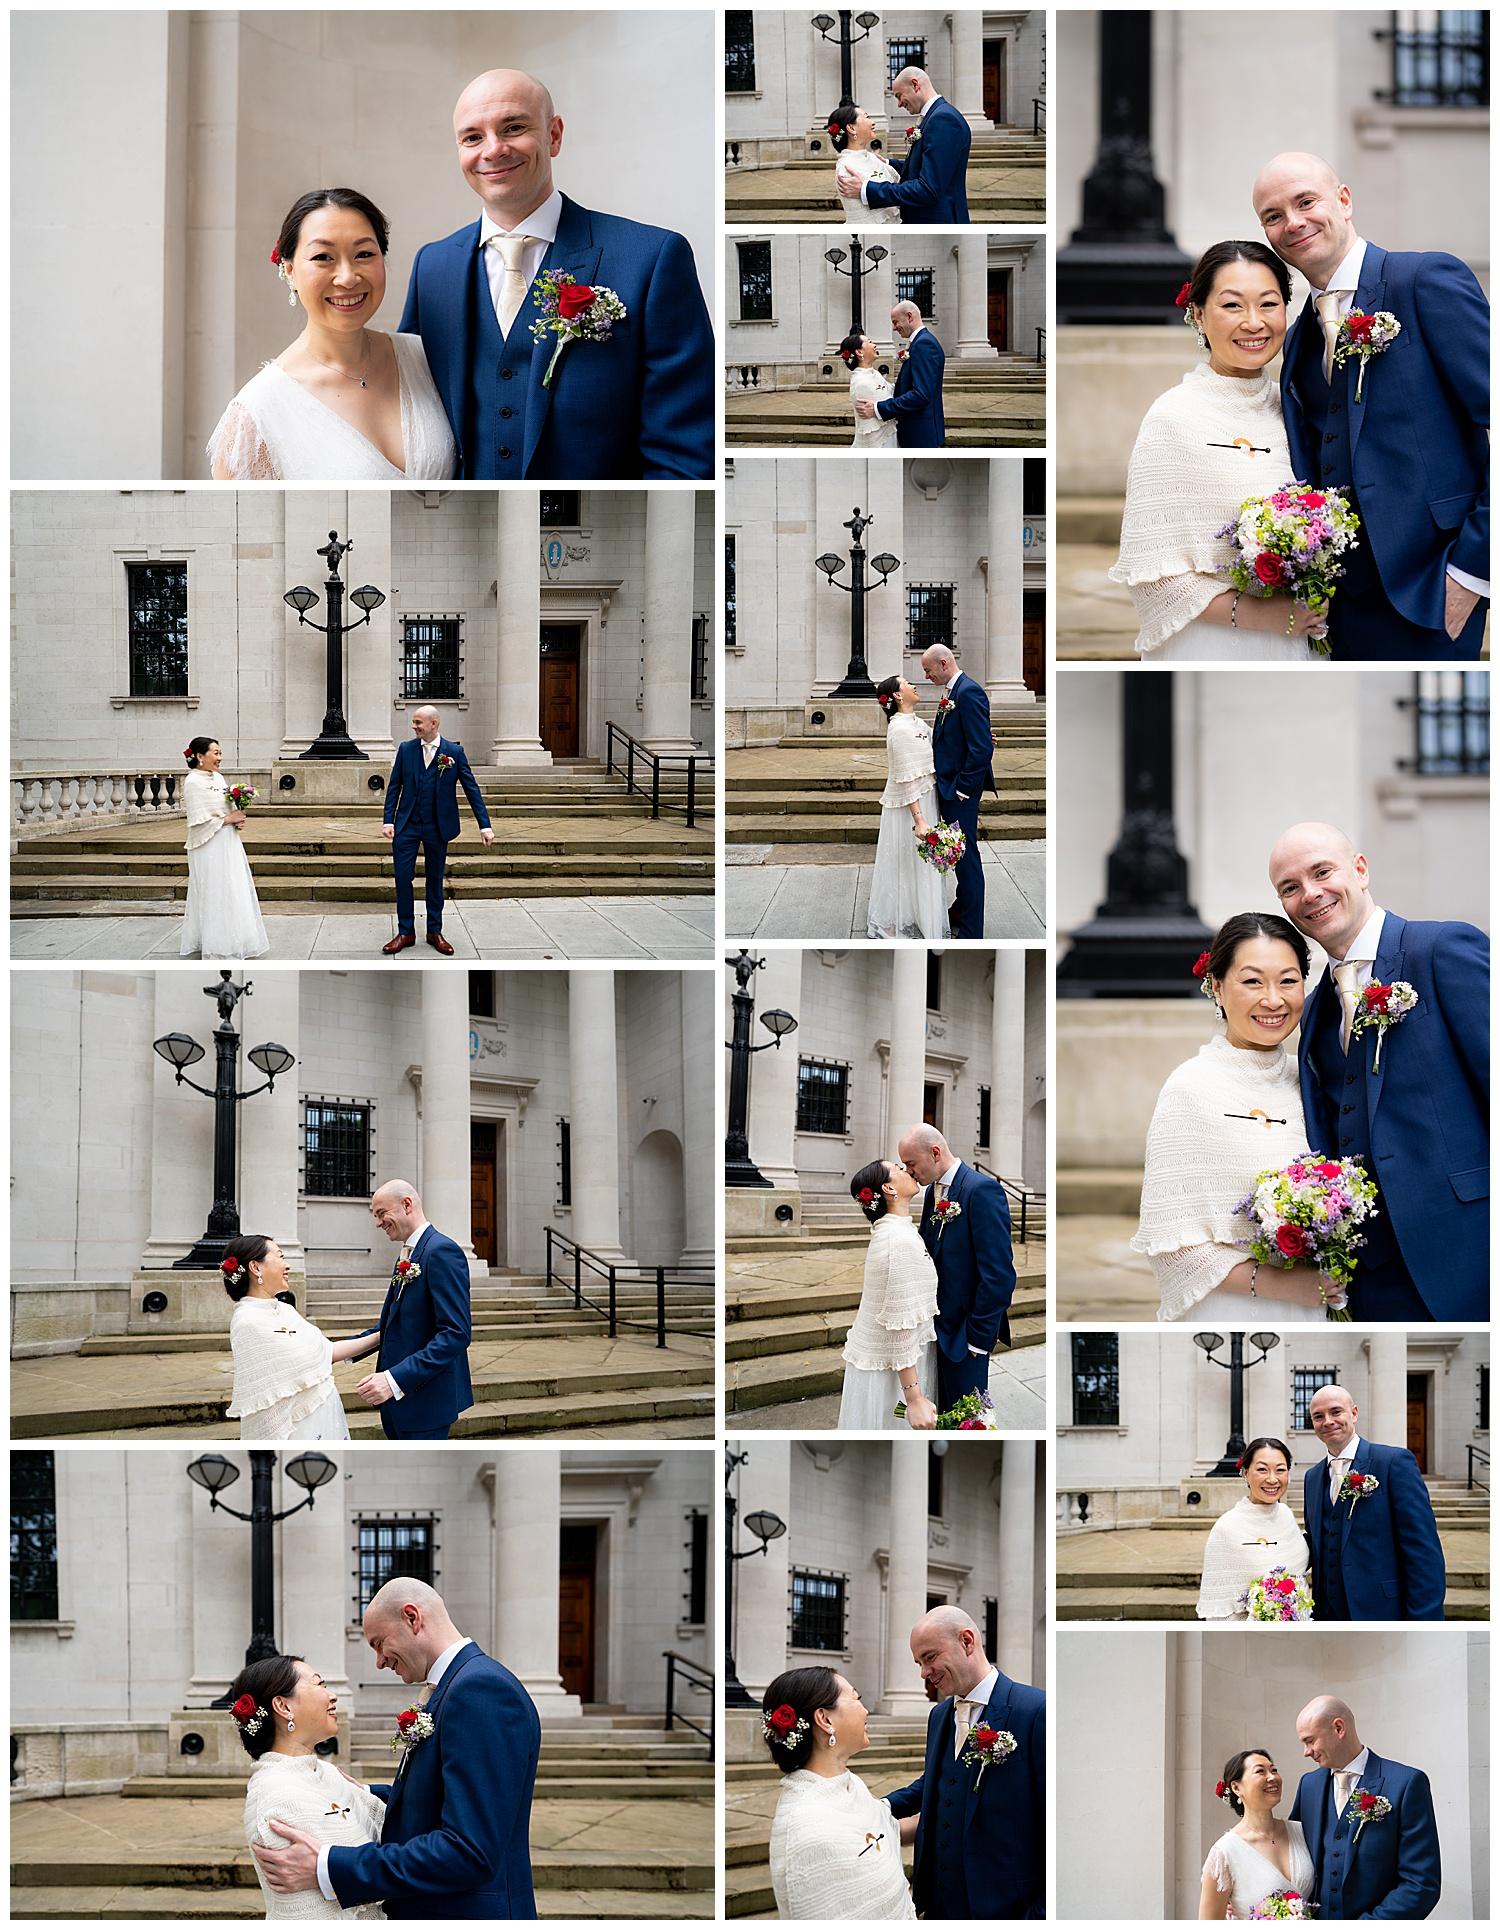 marylebone-town-hall-wedding-1.jpg